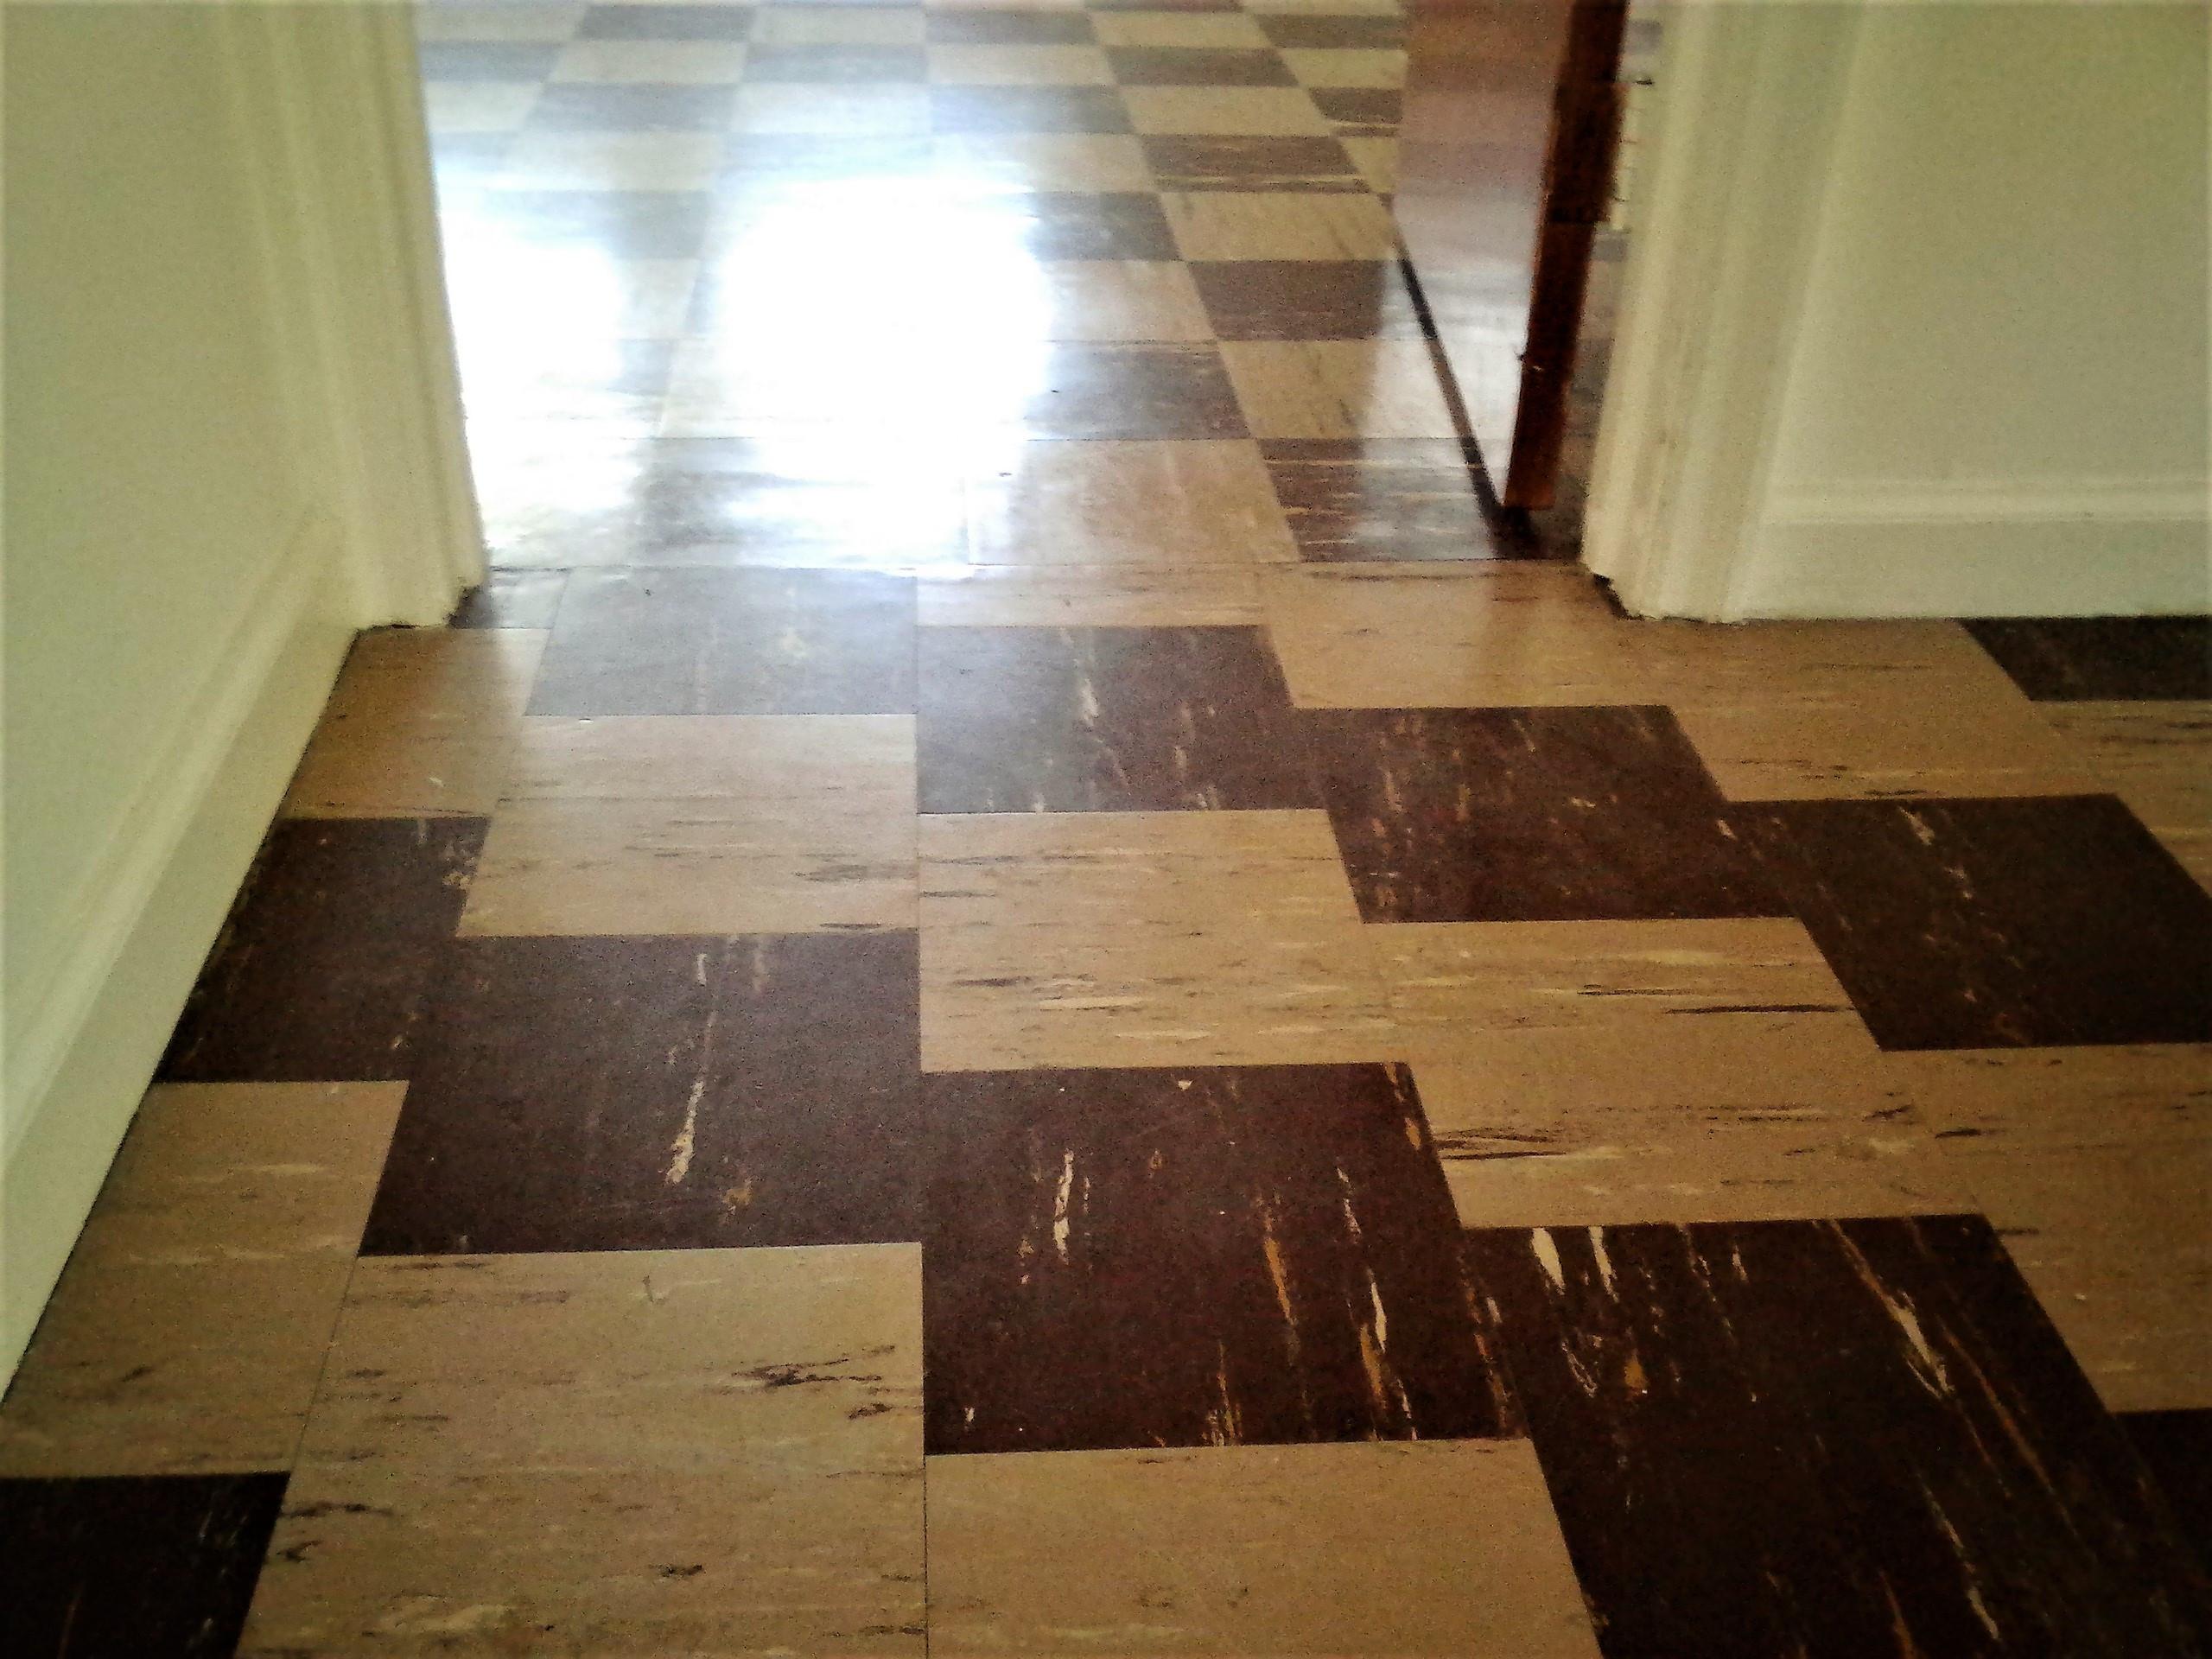 how to install hardwood floors over concrete of asbestos flooring do you really need that abatement the flooring blog regarding old vinyl asbestos tile flooring